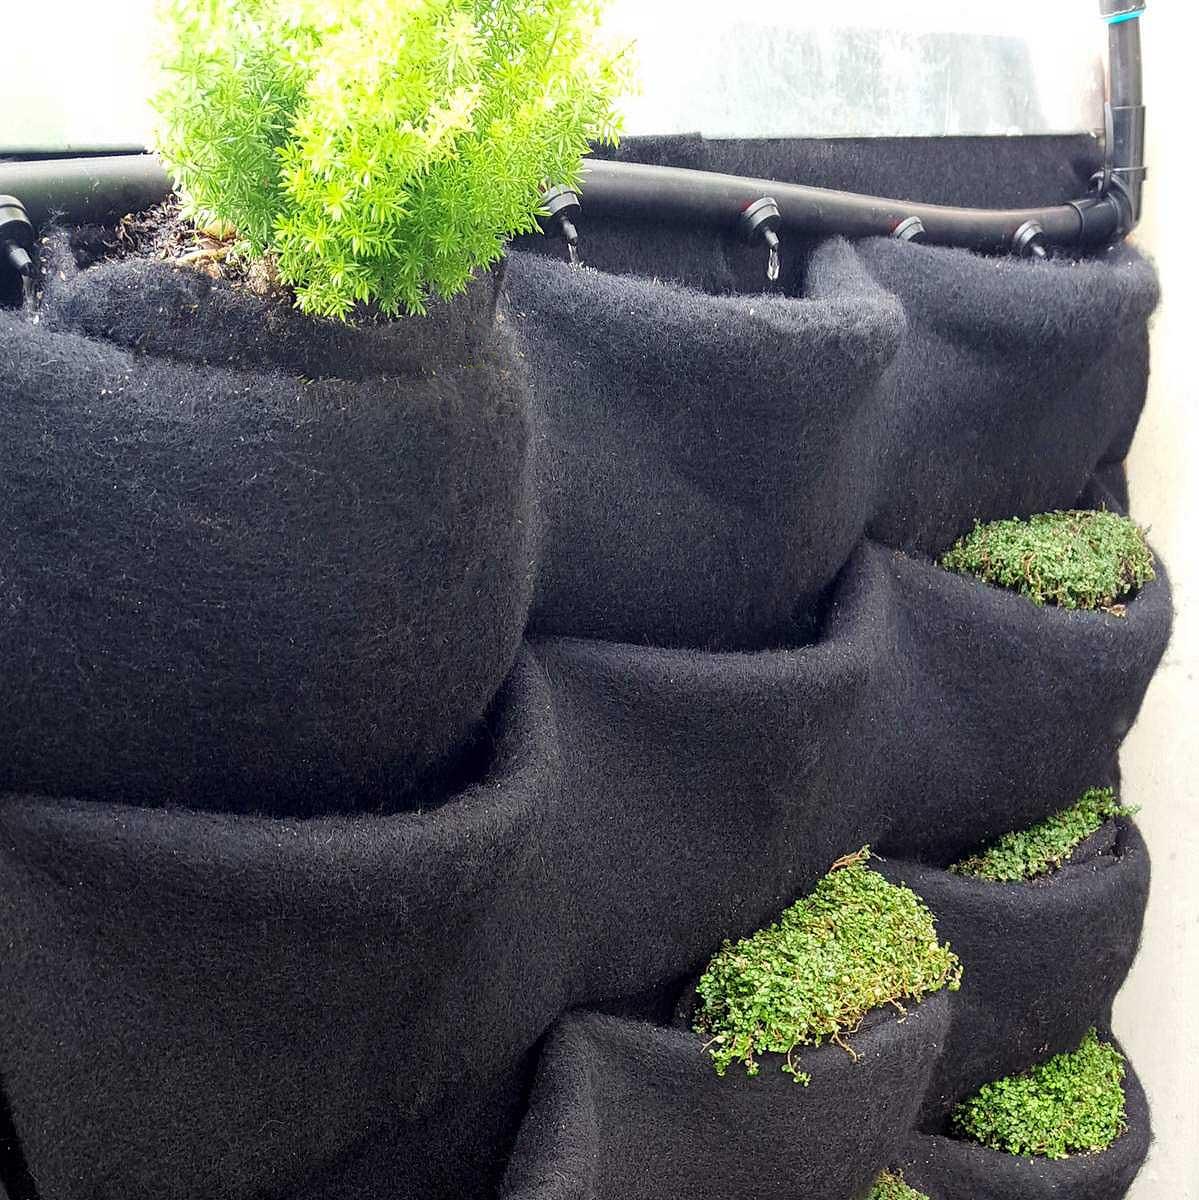 Florafelt-Vertical-Garden-Drip-Irrigation-1-20160111_135319-001.jpg